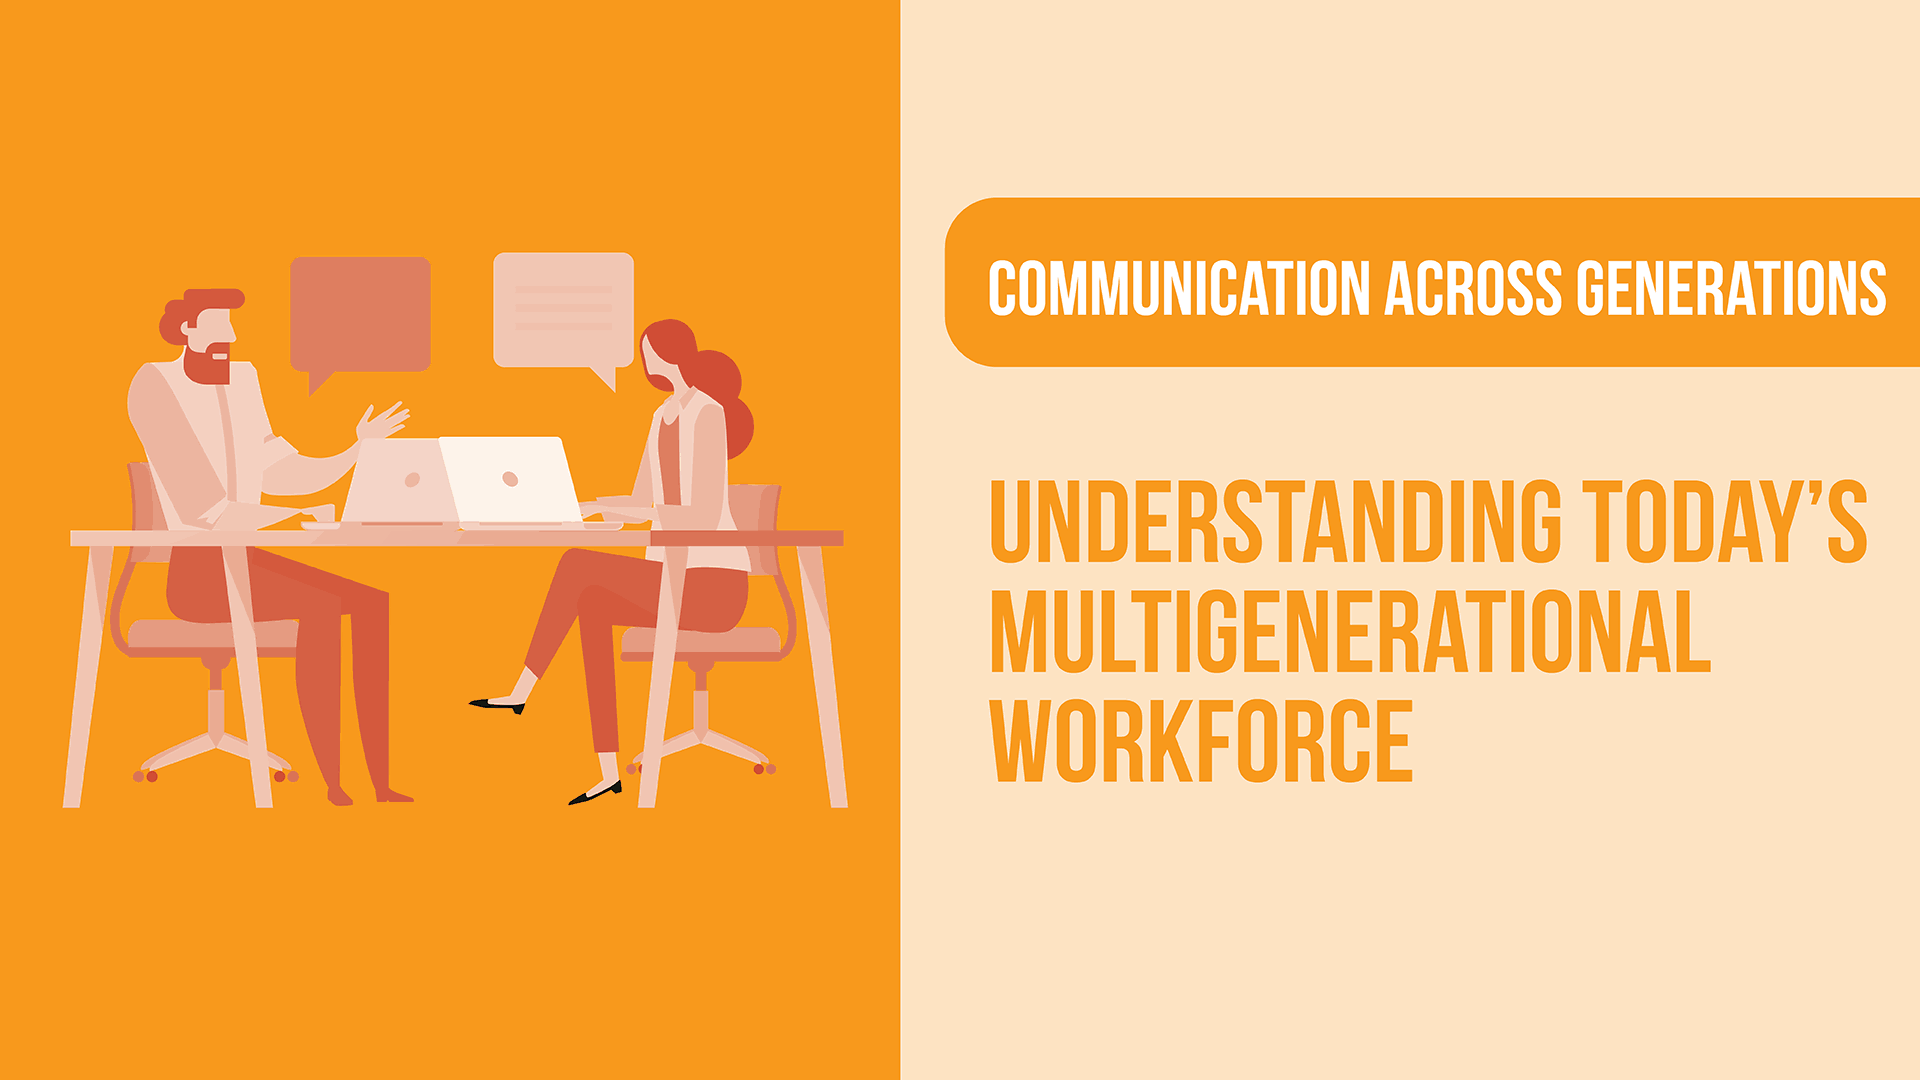 Communication Across Generations: Understanding Today's Multigenerational Workforce